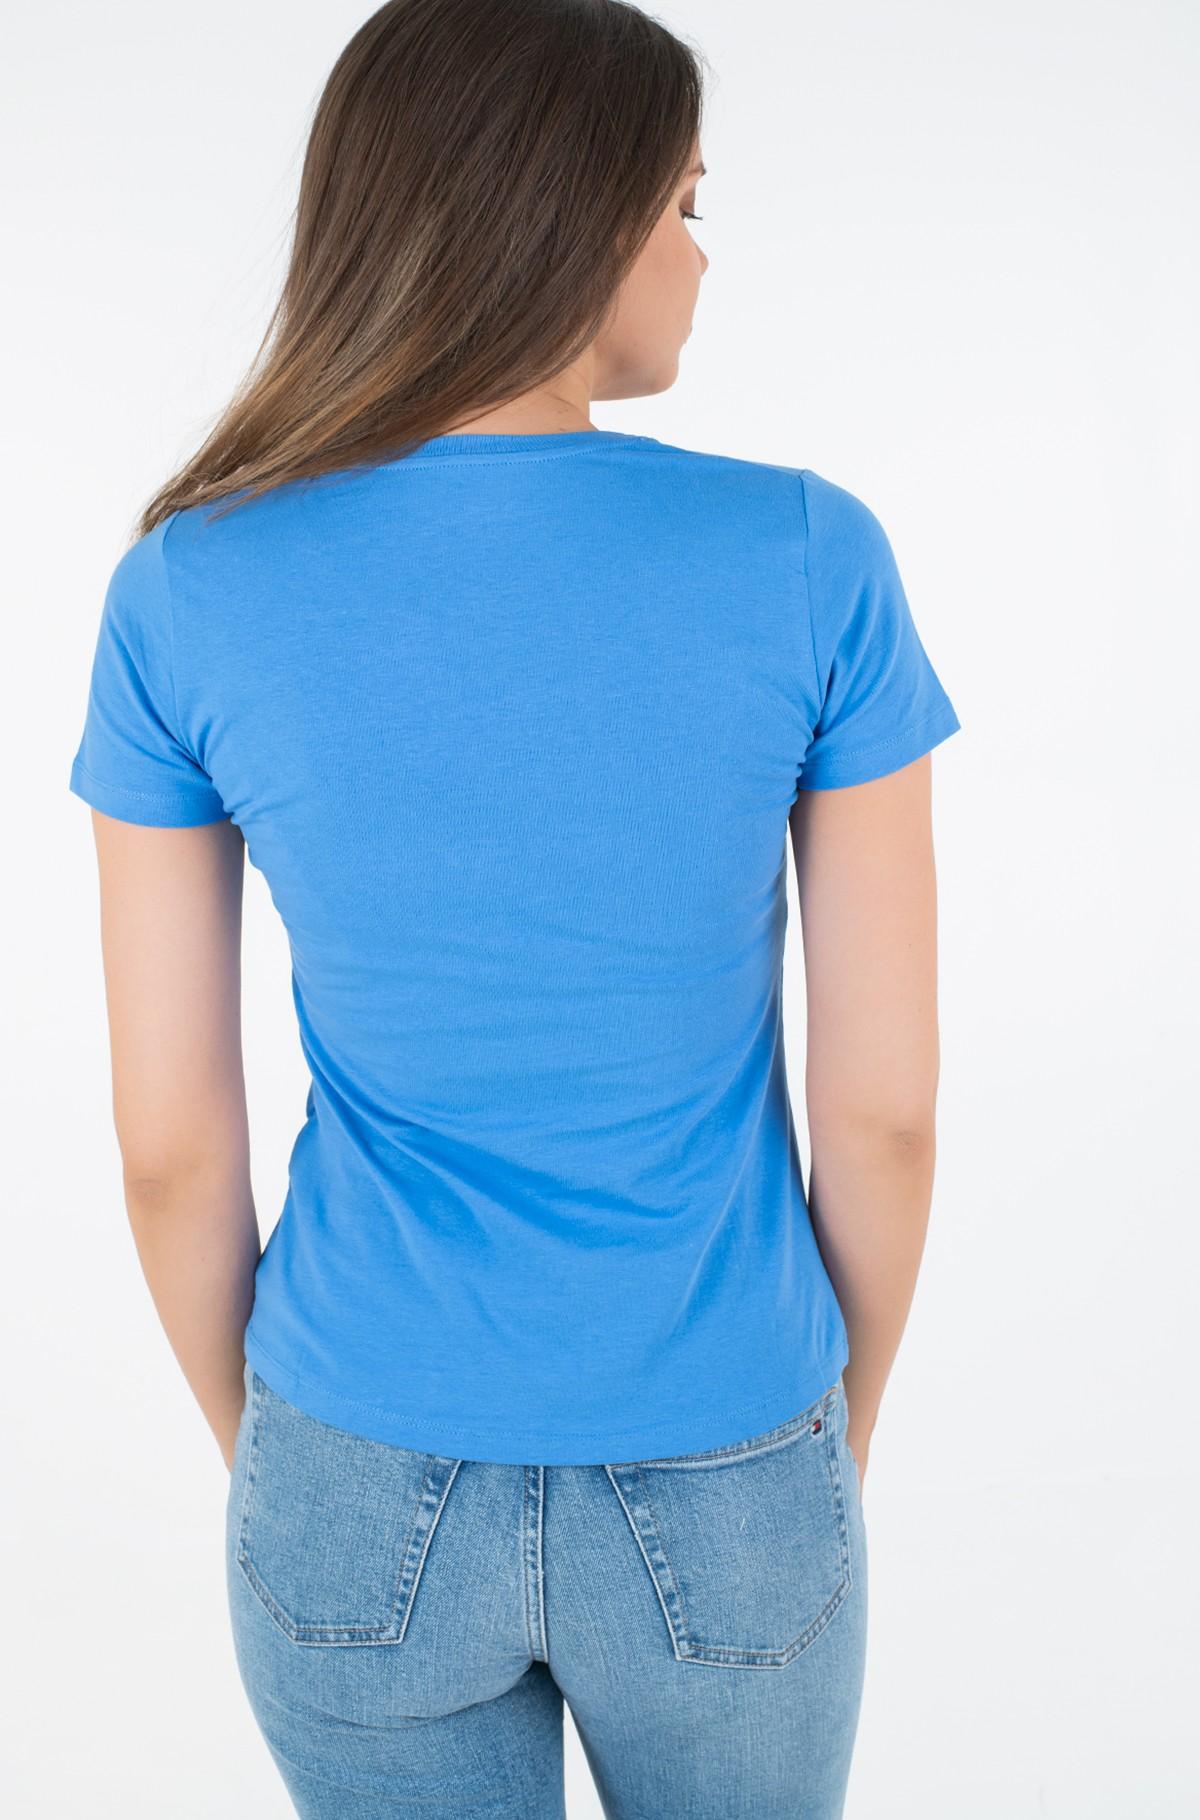 T-shirt NEW VIRGINIA/PL502711 -full-2